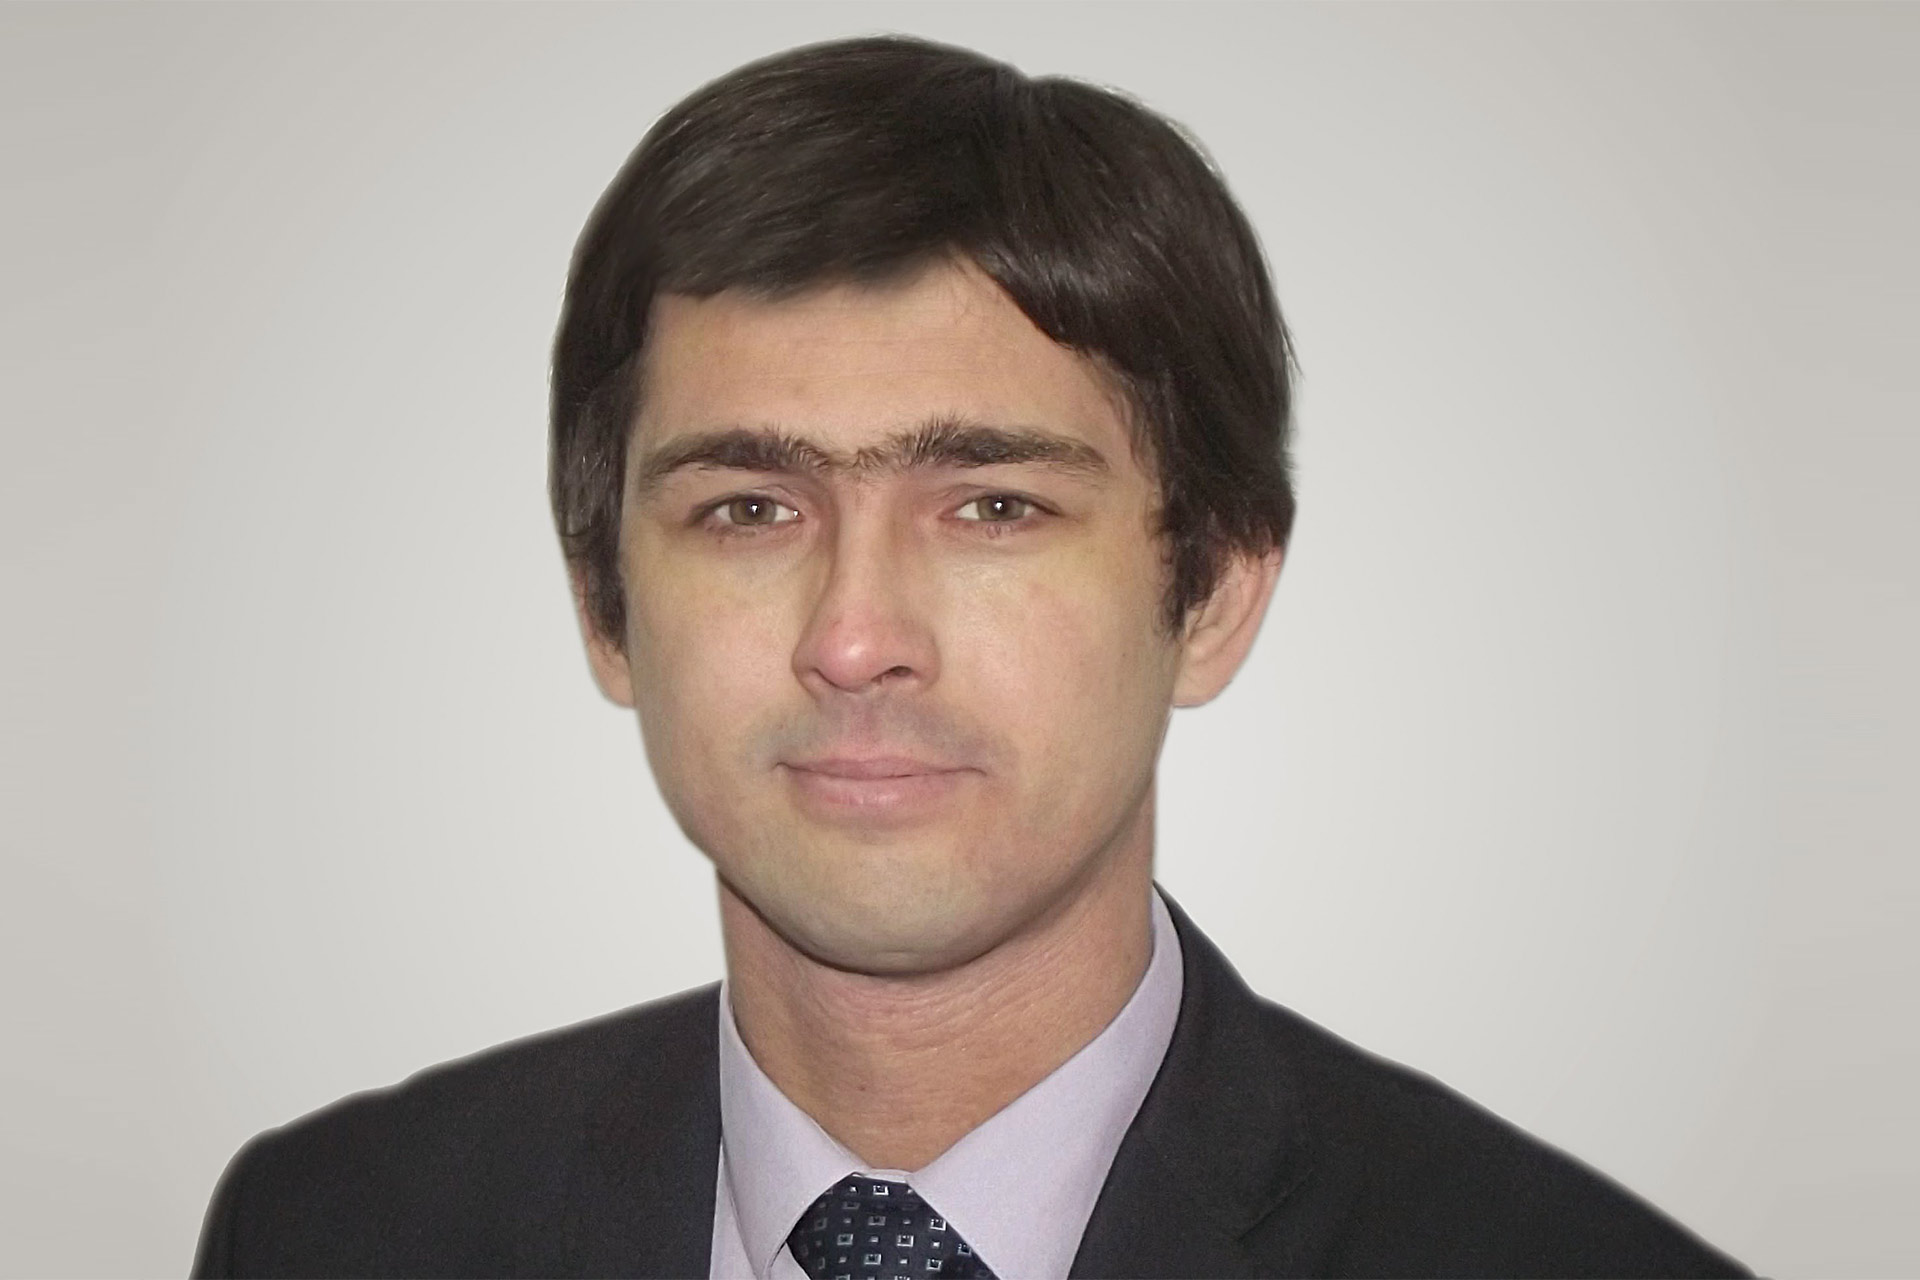 Александр Захаренко. Оптимизация управления в бизнесе